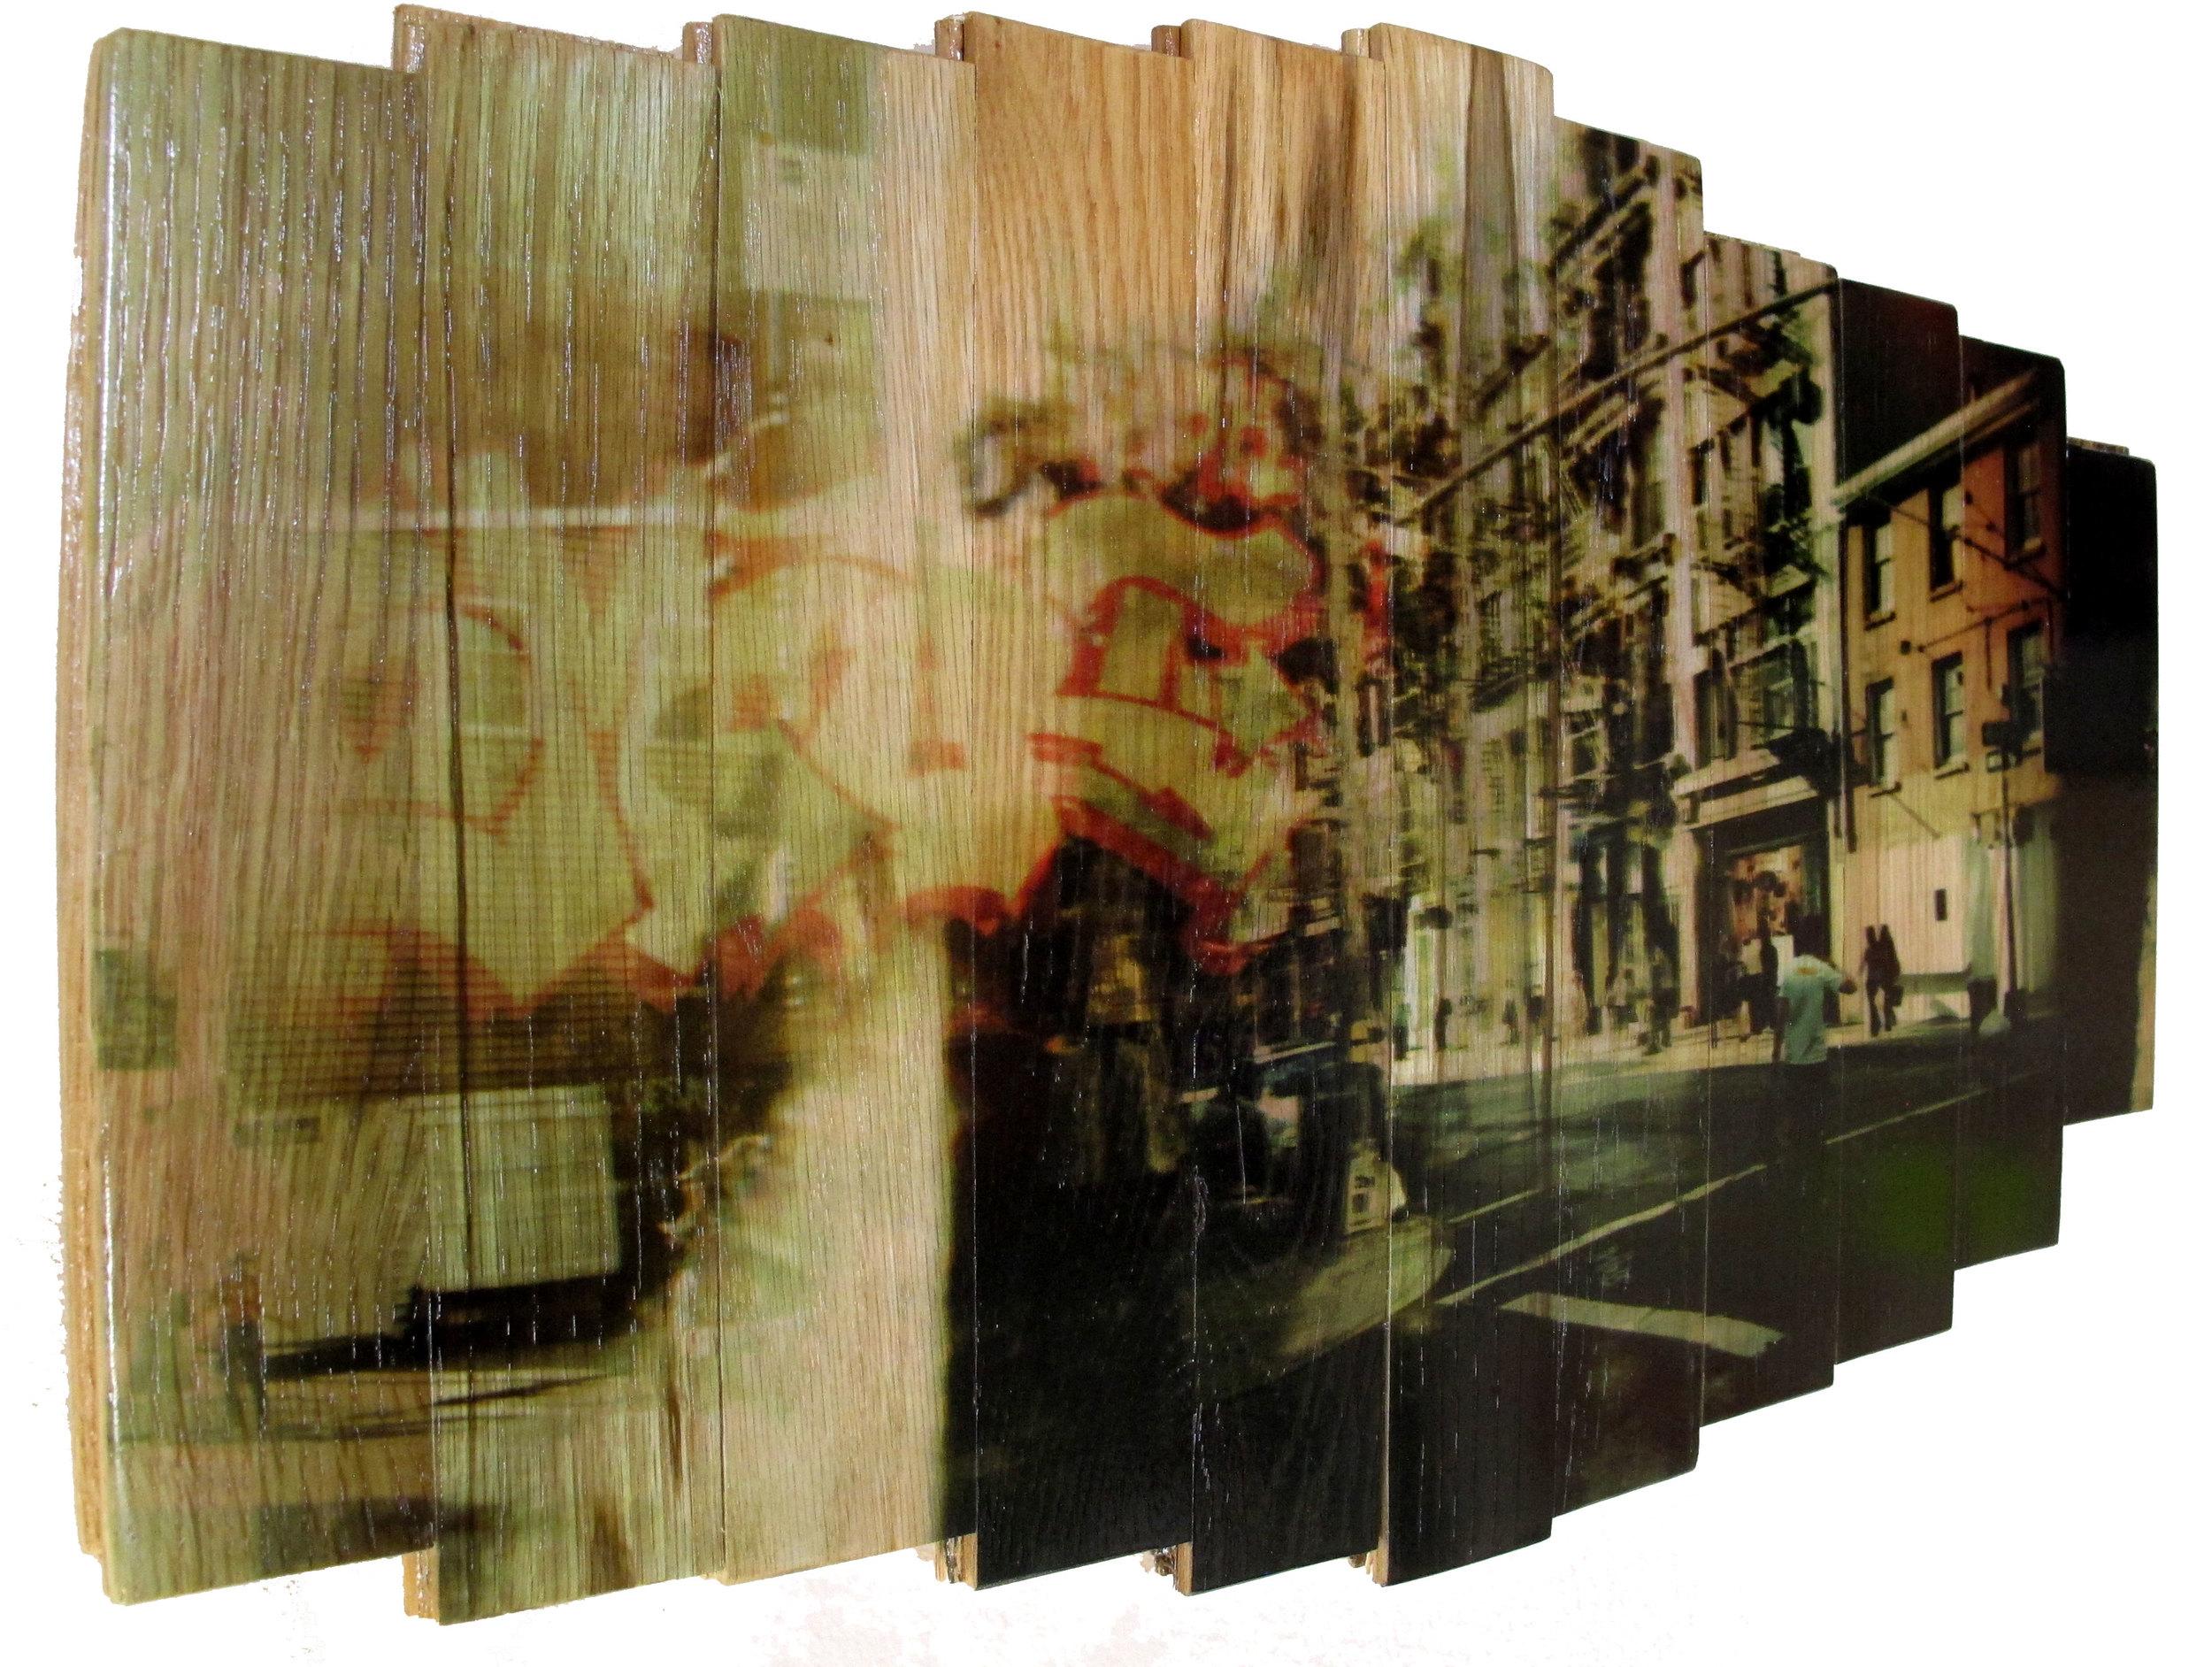 Wooster Street,  2016 c print on reclaimed wood floor 16 x 25.5 x 1.5 in / 41 x 65 x 4 cm  Unique